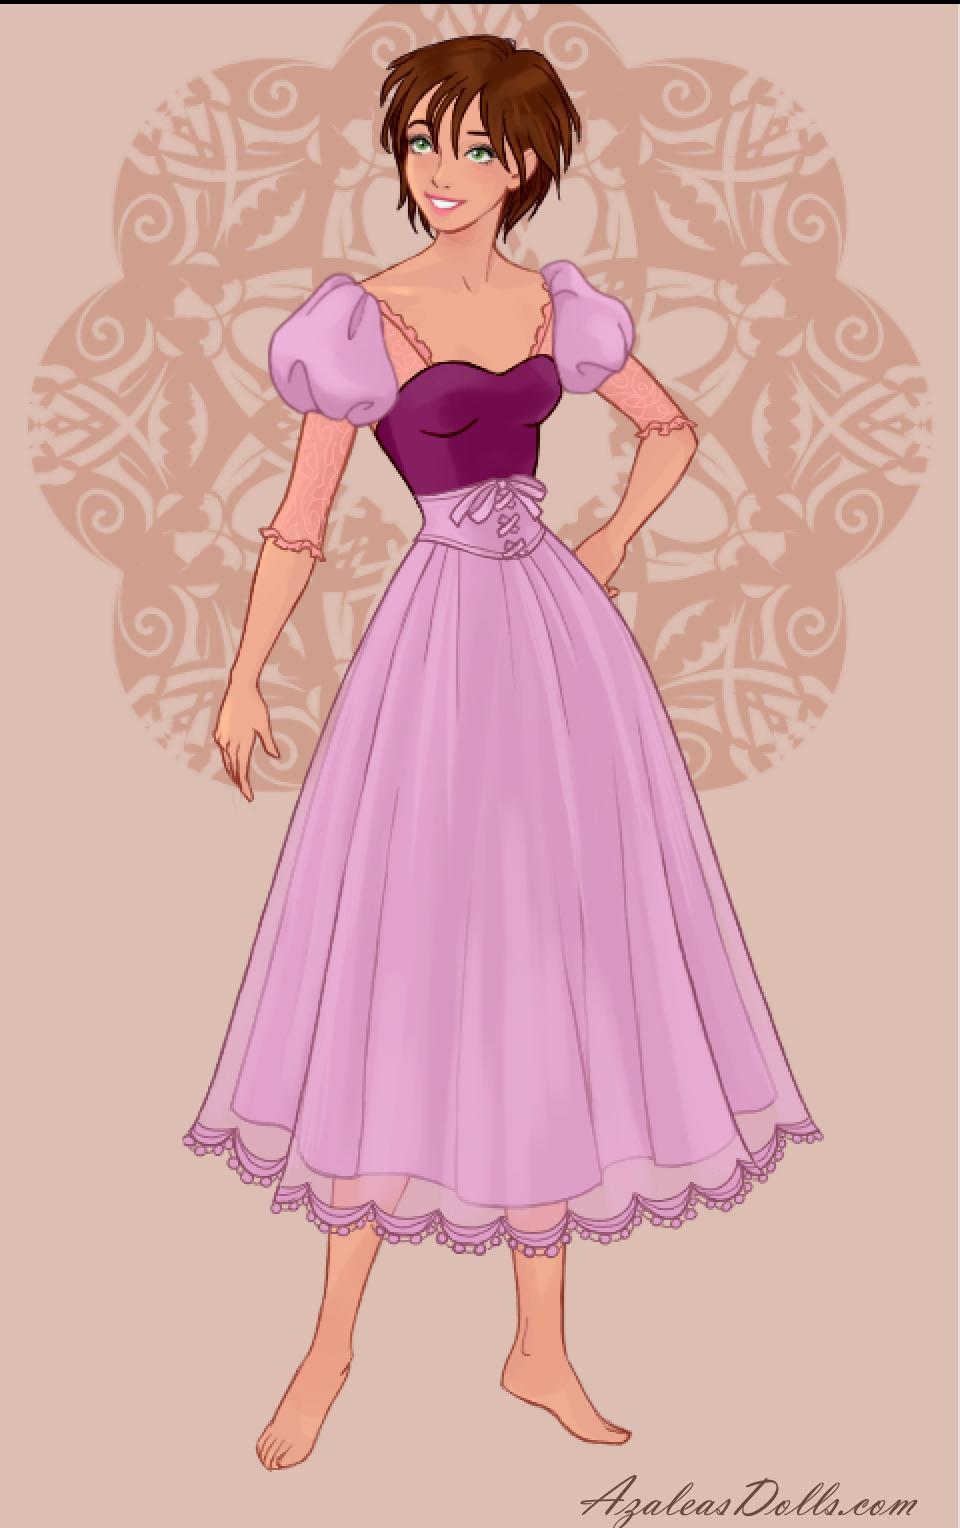 Rapunzel with short brown hair in Wedding Dress